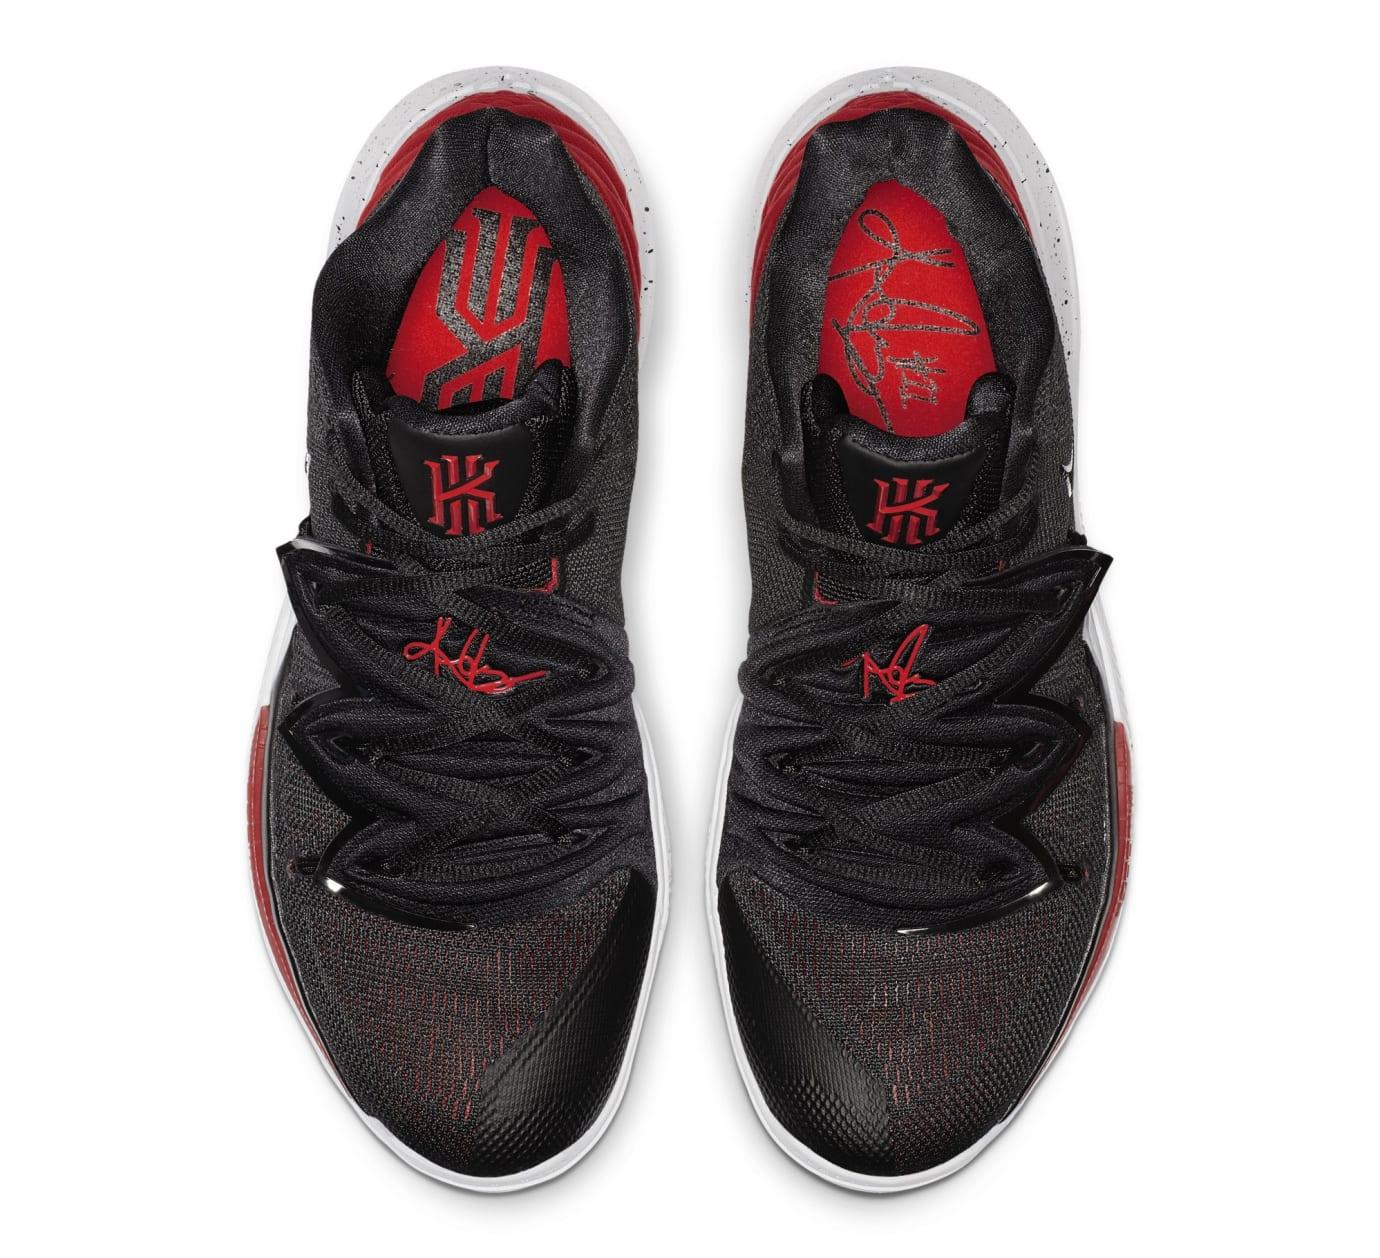 8dda0e693a23 Image via Nike Nike Kyrie 5  University Red Black  AO2919-600 (Top)